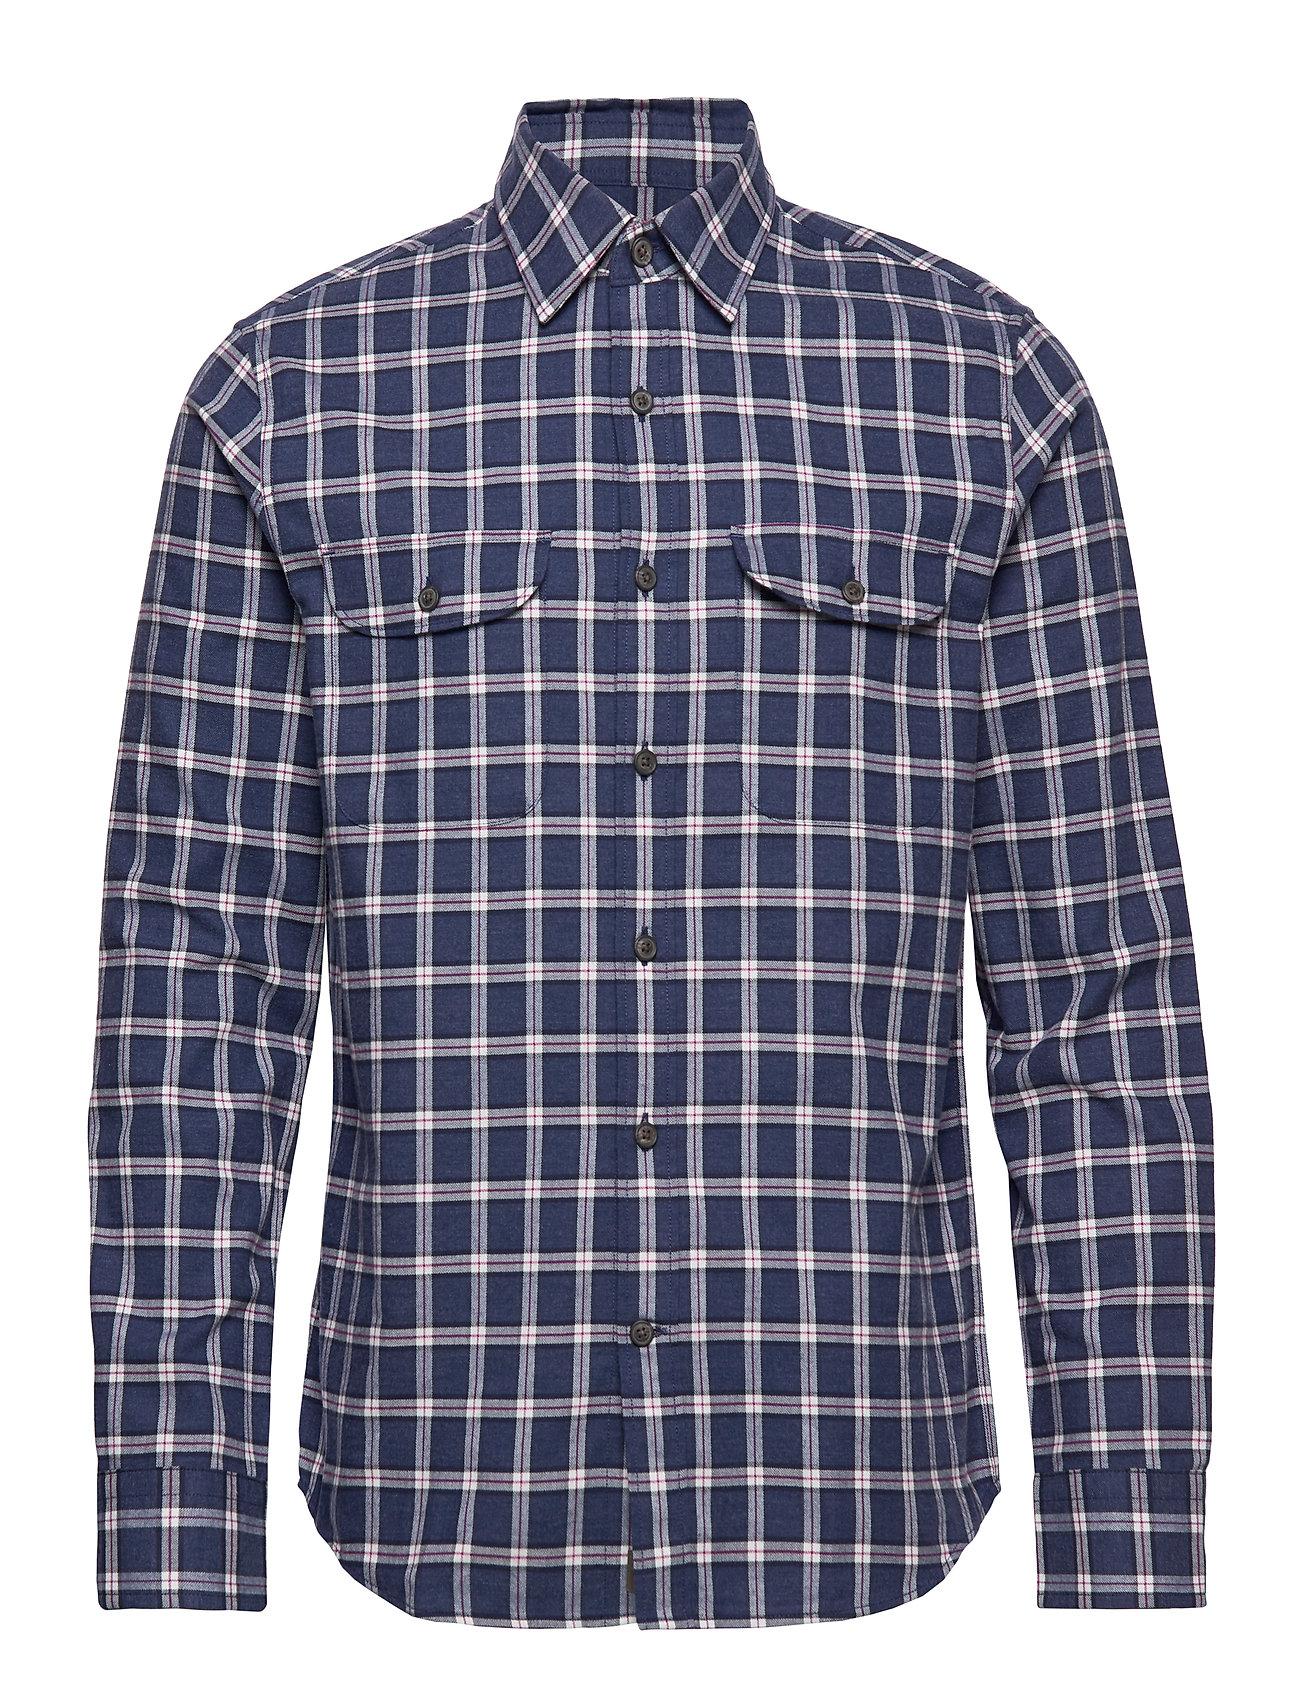 Banana Republic Untucked Slim-Fit Flannel Shirt - PURPLE/BLUE2